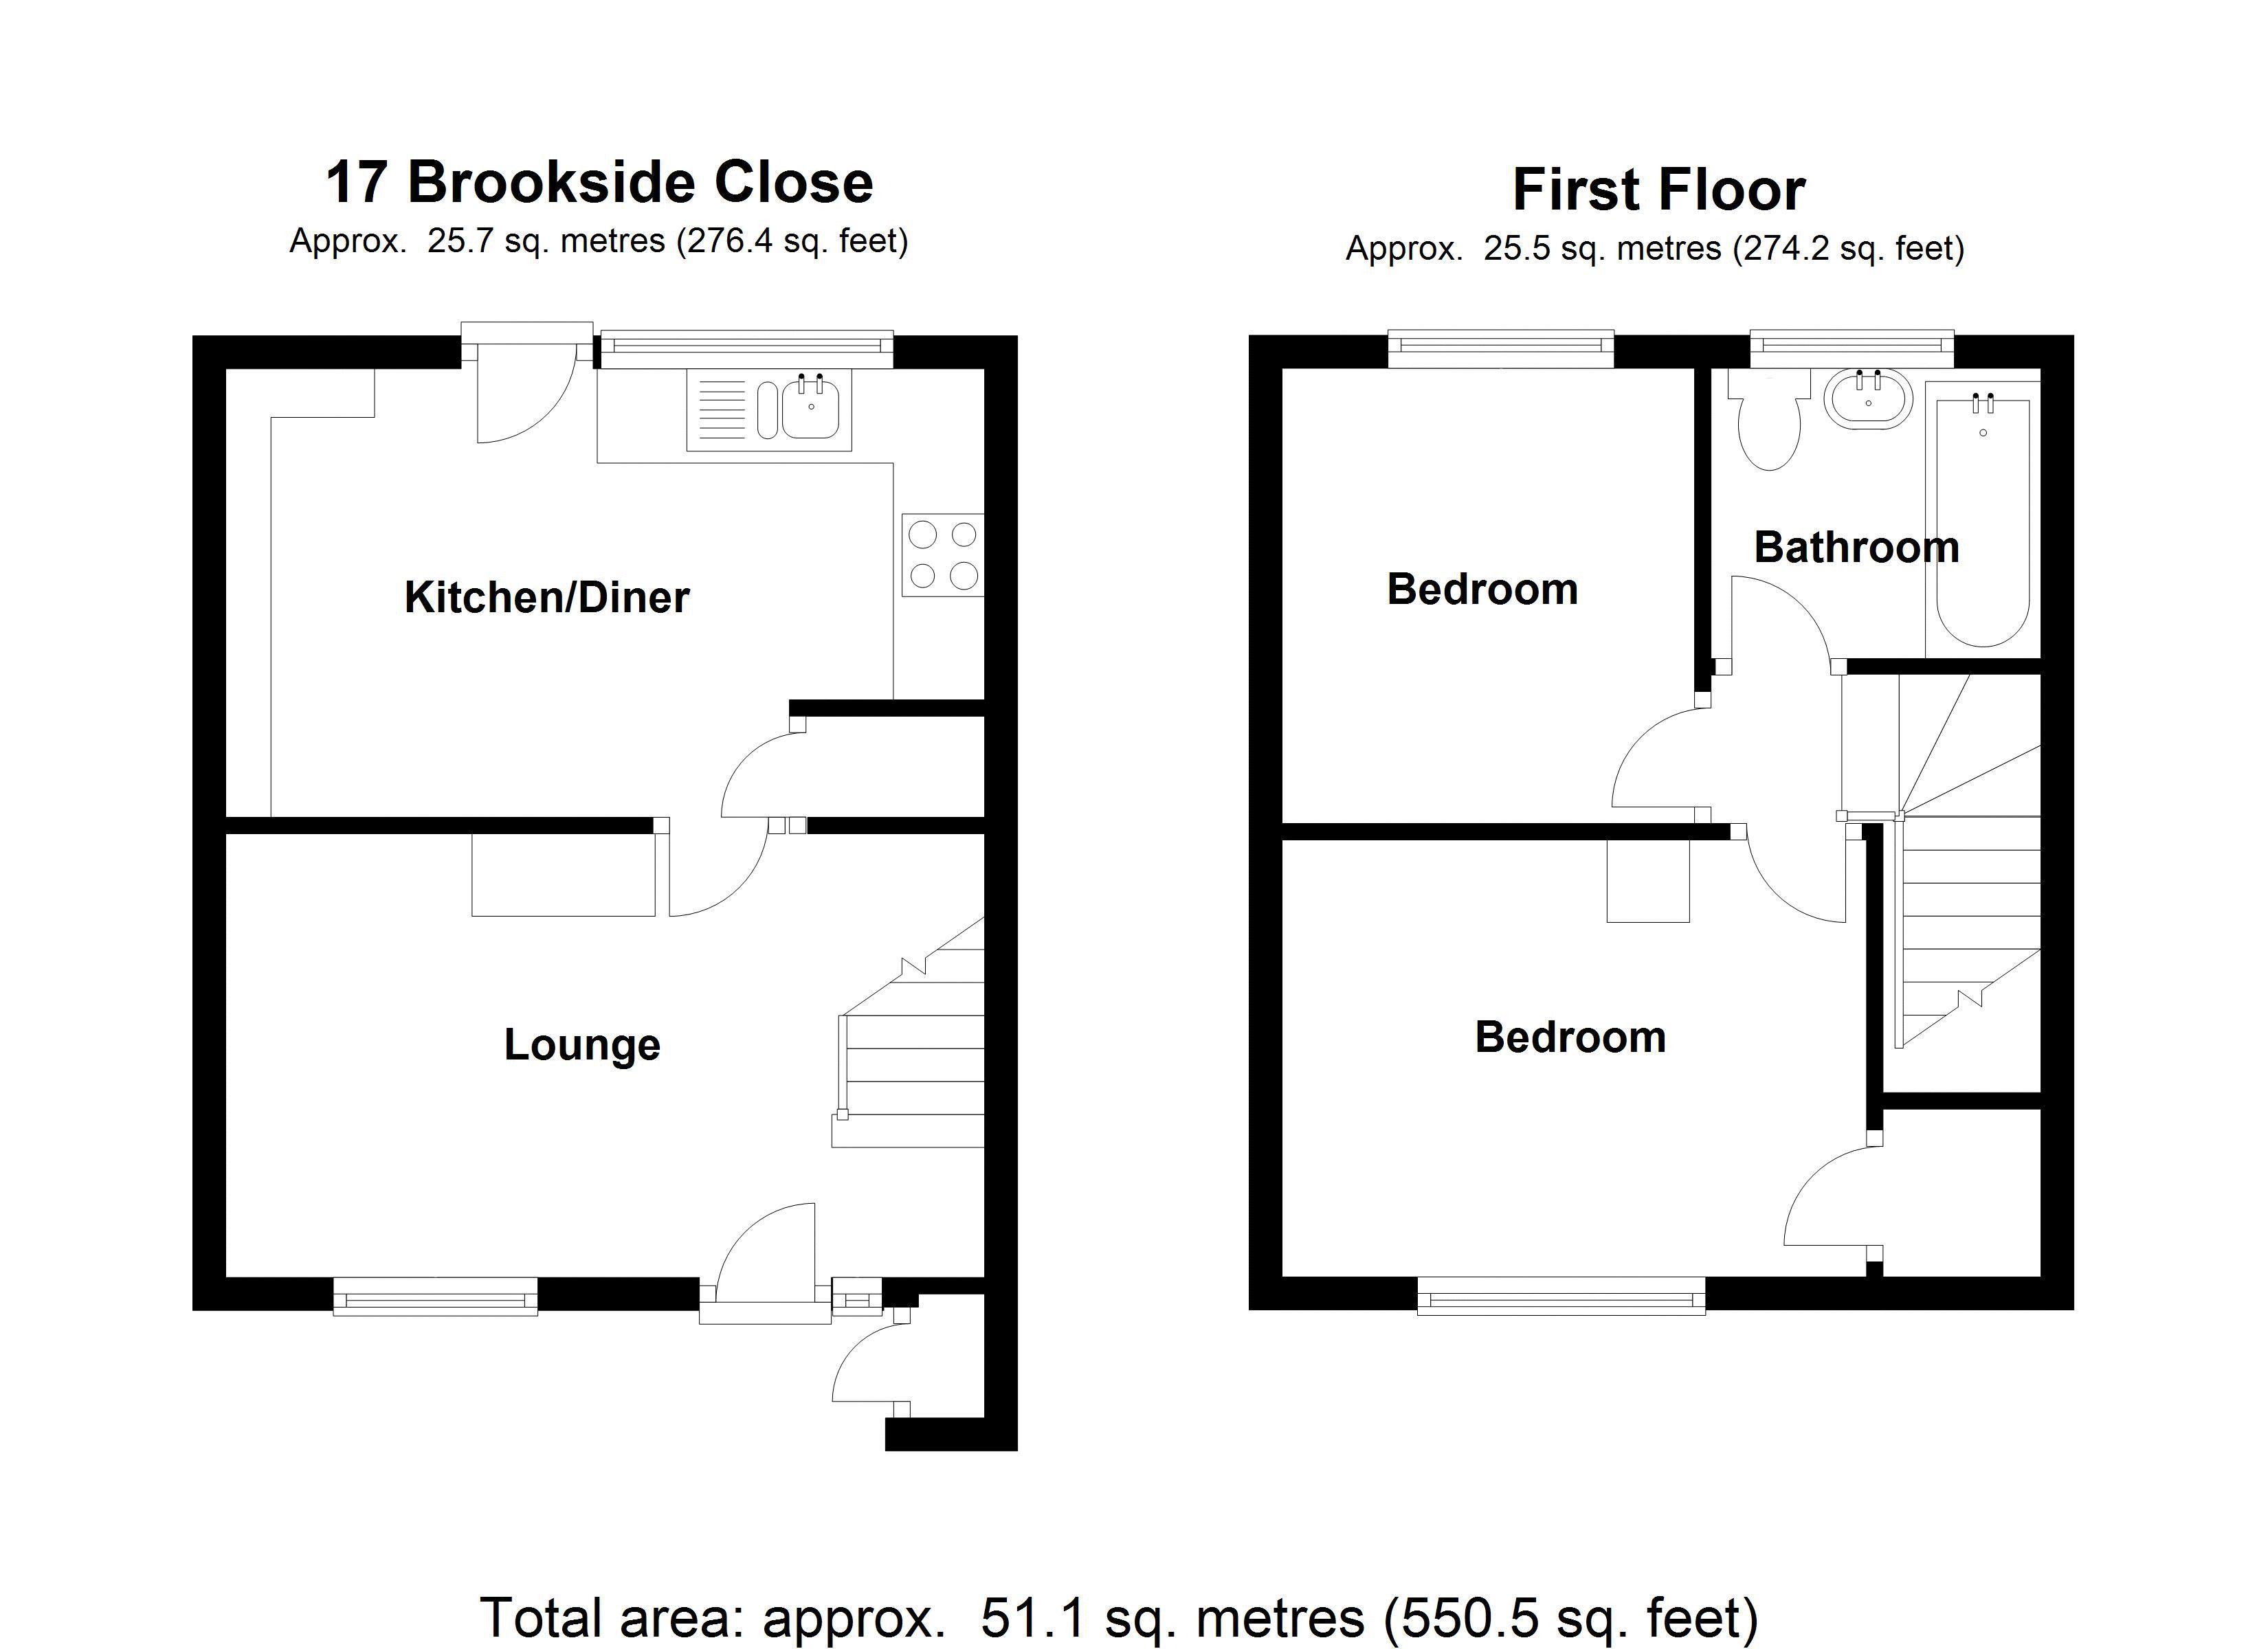 17 Brookside Close - Floor Plan